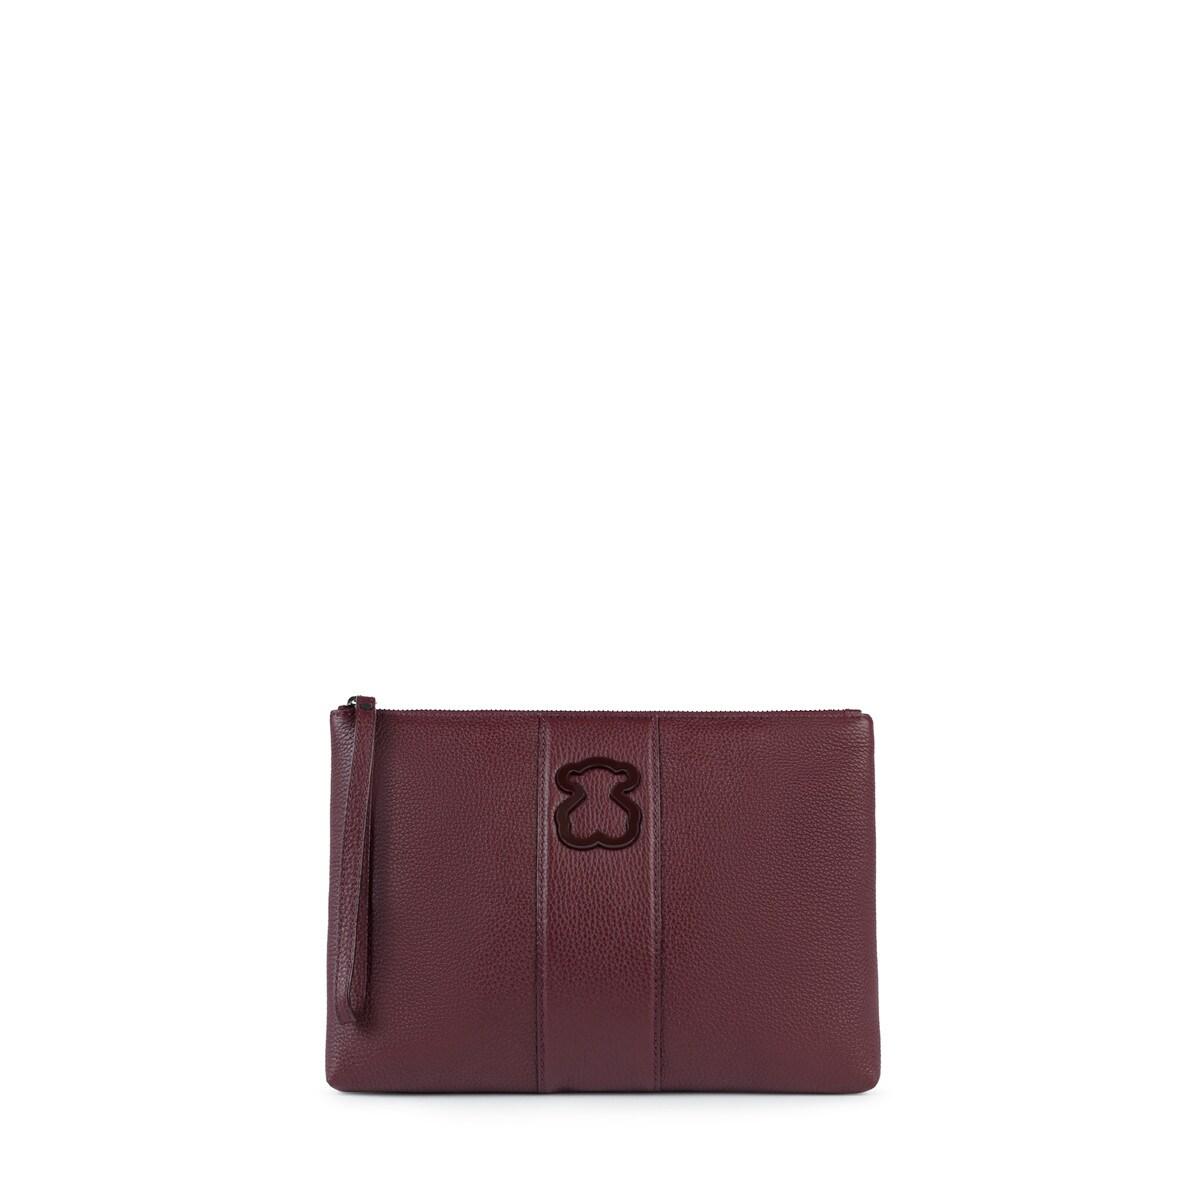 67a2cde73f Τσάντα φάκελος Alfa από Δέρμα σε μπορντό χρώμα - Tous Site Grecia